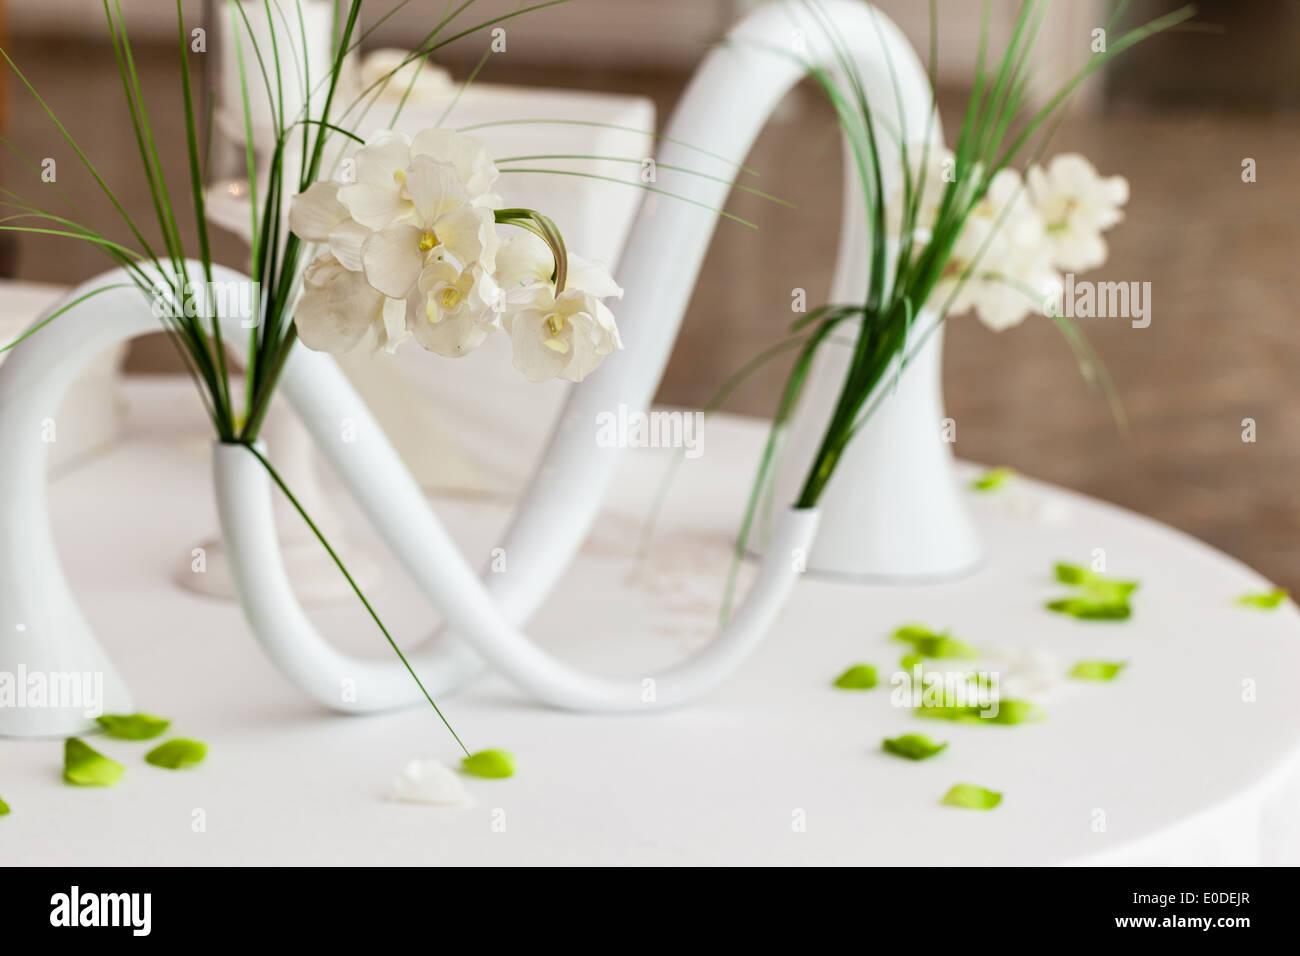 Flower Bouquet Daffodils Vase Table Stock Photos & Flower Bouquet ...